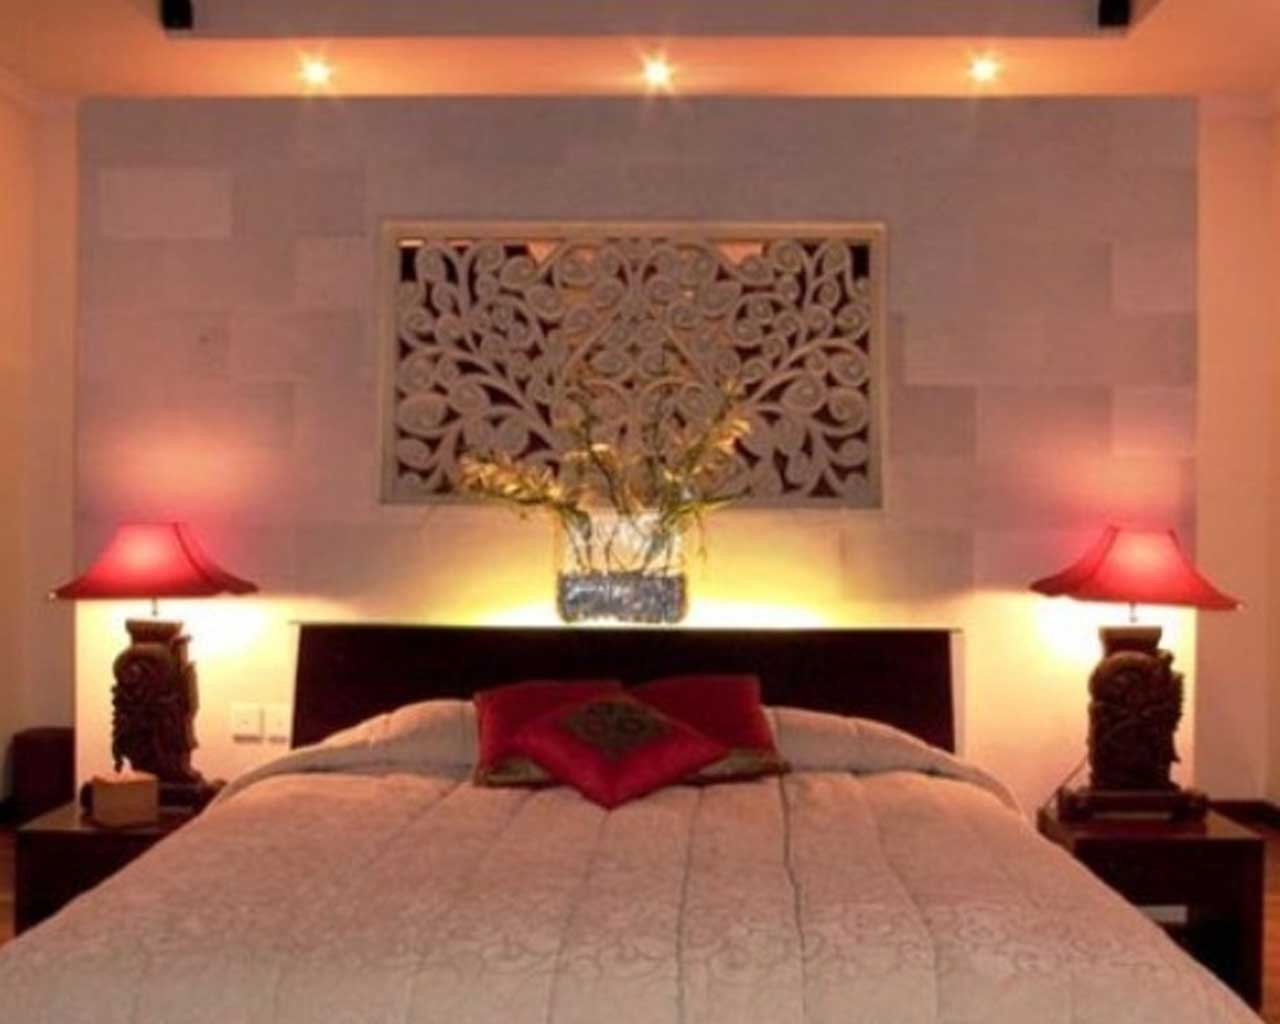 bedroom lamp ideas photo - 7